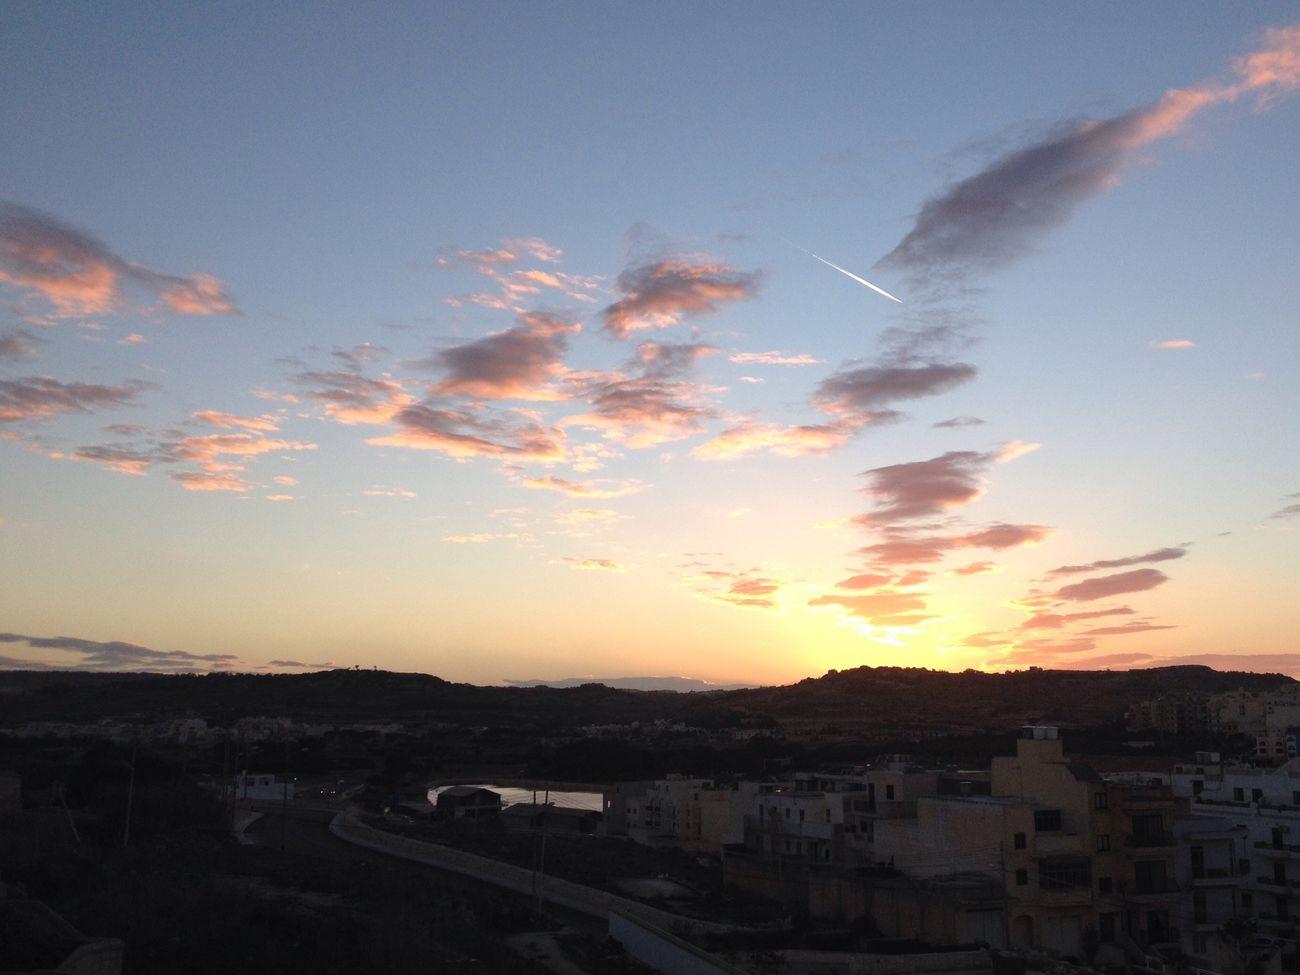 Sky Clouds And Sky Sunset Dusky Sky